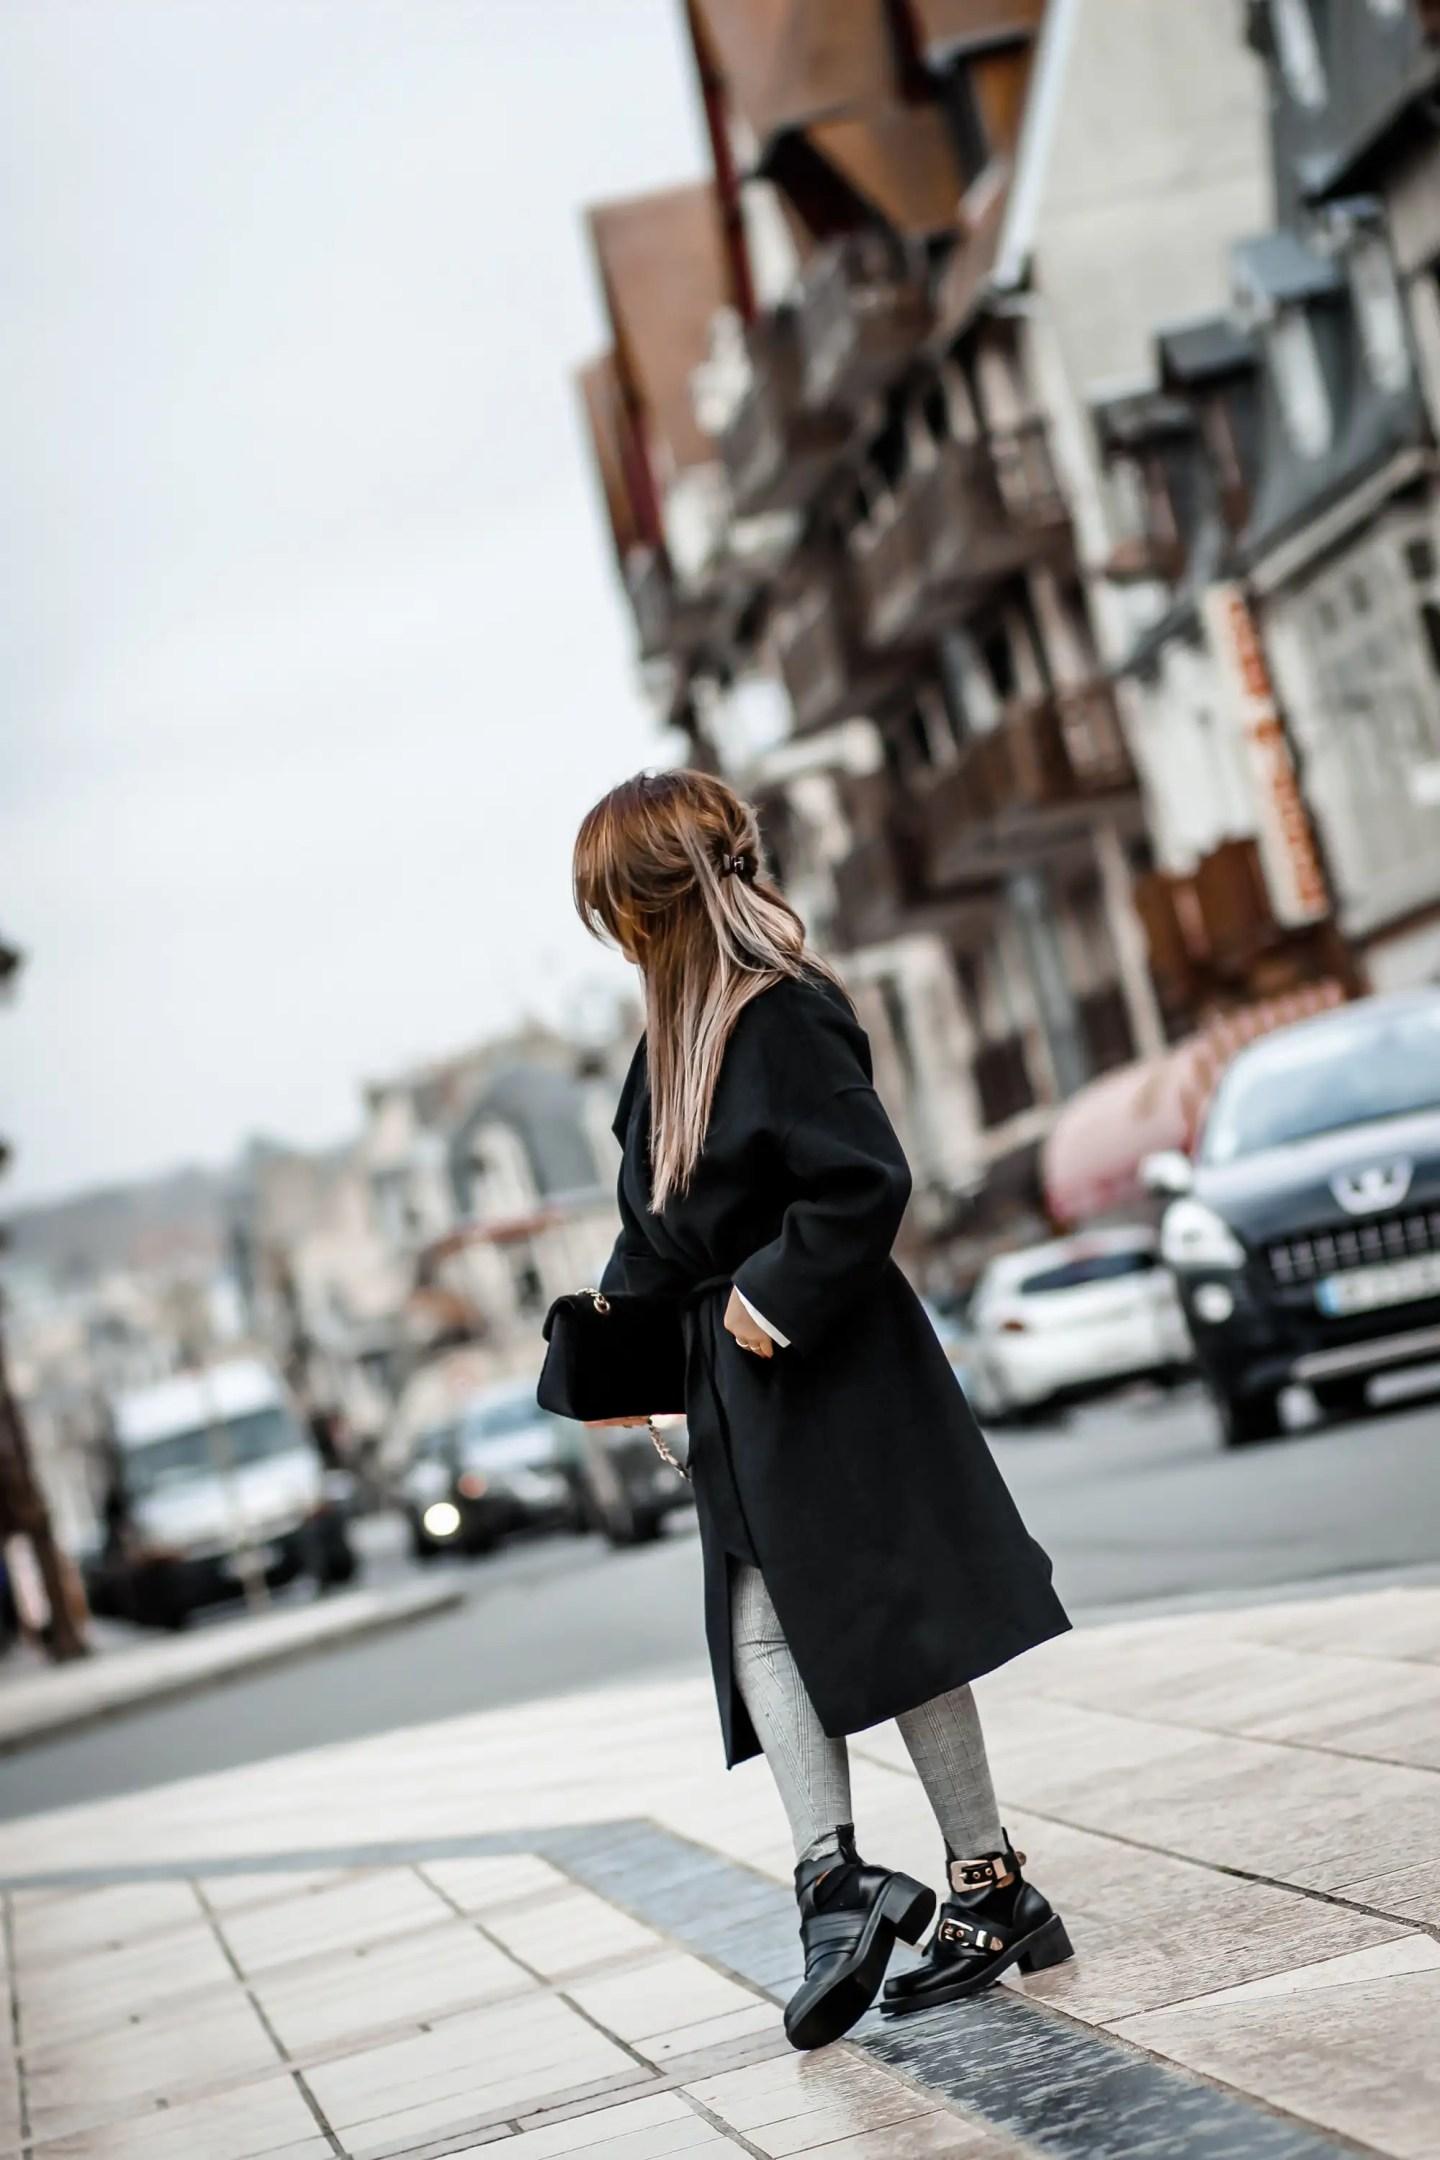 blogueuse mode, the green ananas, blog mode, blog, zara, manteau peignoir, pantalon prince de galles, inspi gucci, chemise blanche femme, manteau noir femme, manteau loose, boots balanciaga, le manteau peignoir